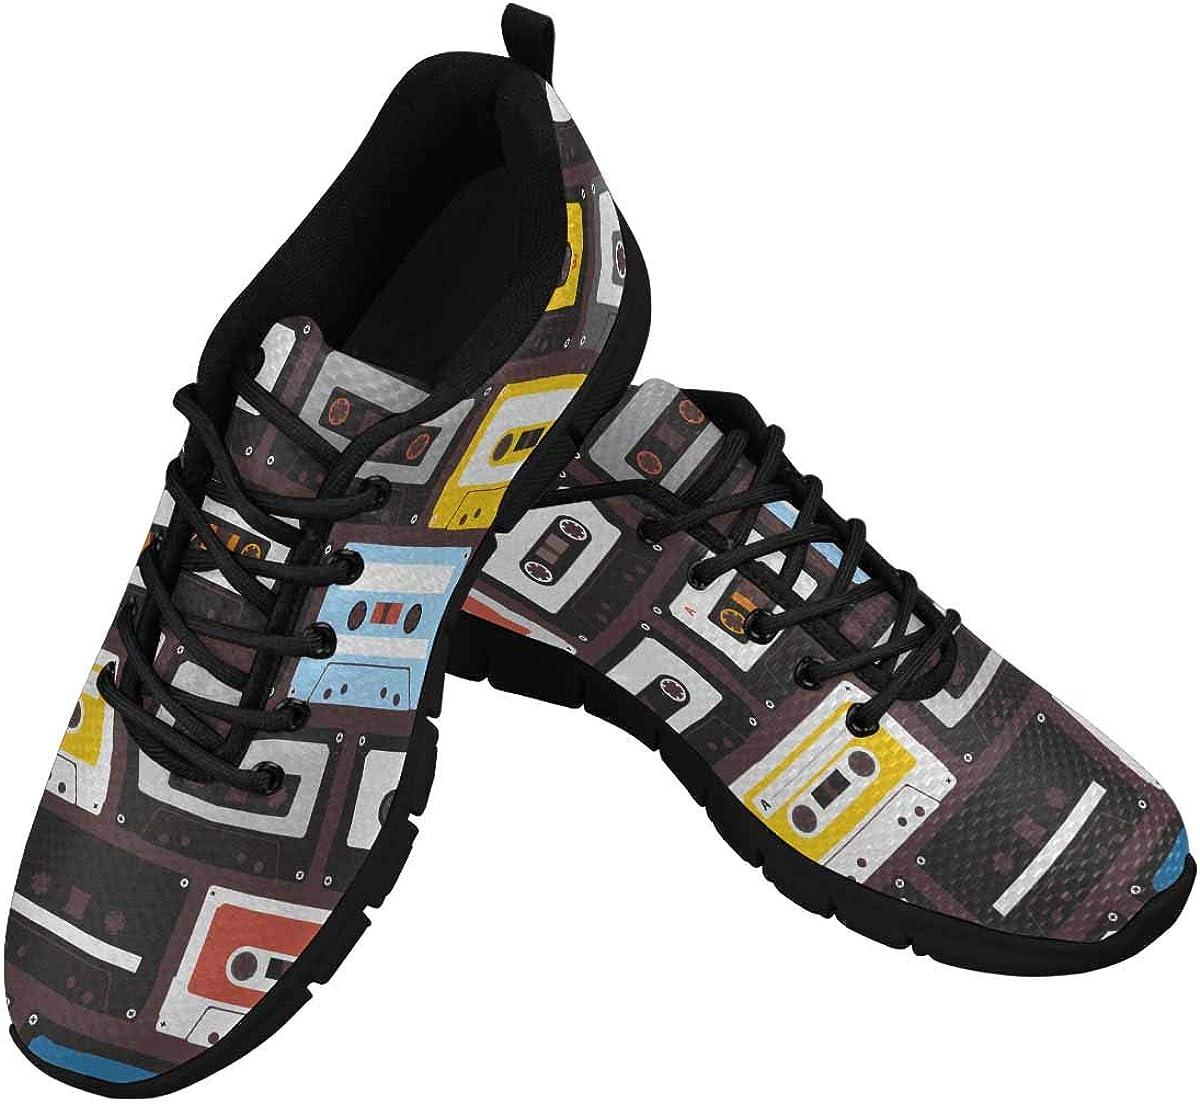 InterestPrint Vintage Audio Cassettes Women's Walking Shoes Lightweight Casual Running Sneakers